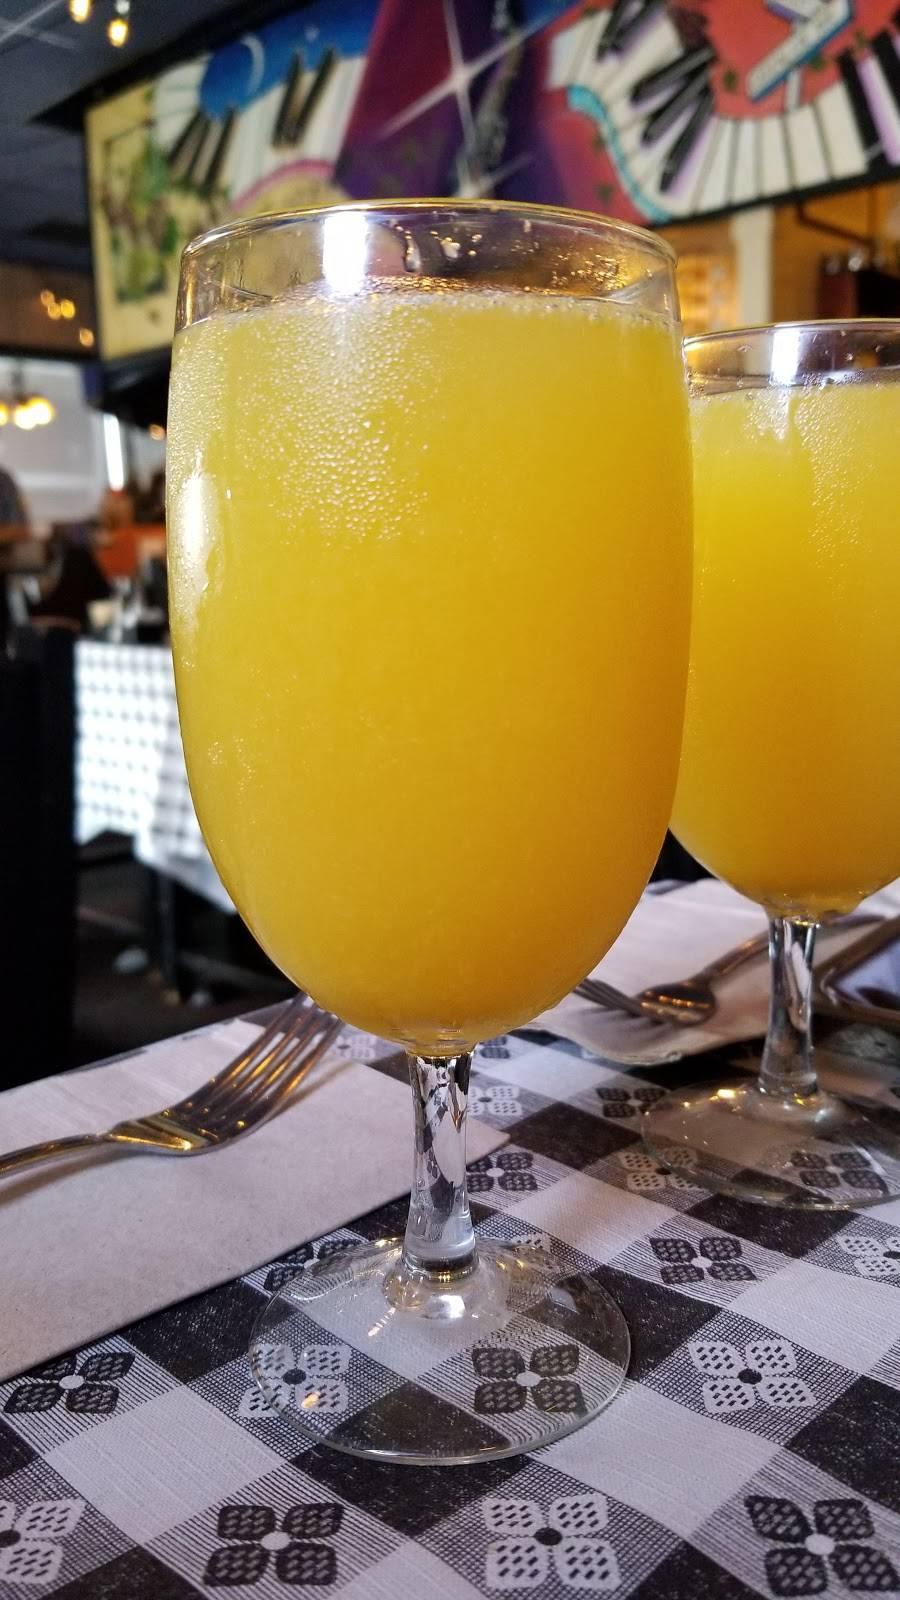 Crêpes & Grapes Café | cafe | 6560 Greenleaf Ave, Whittier, CA 90601, USA | 5626963255 OR +1 562-696-3255